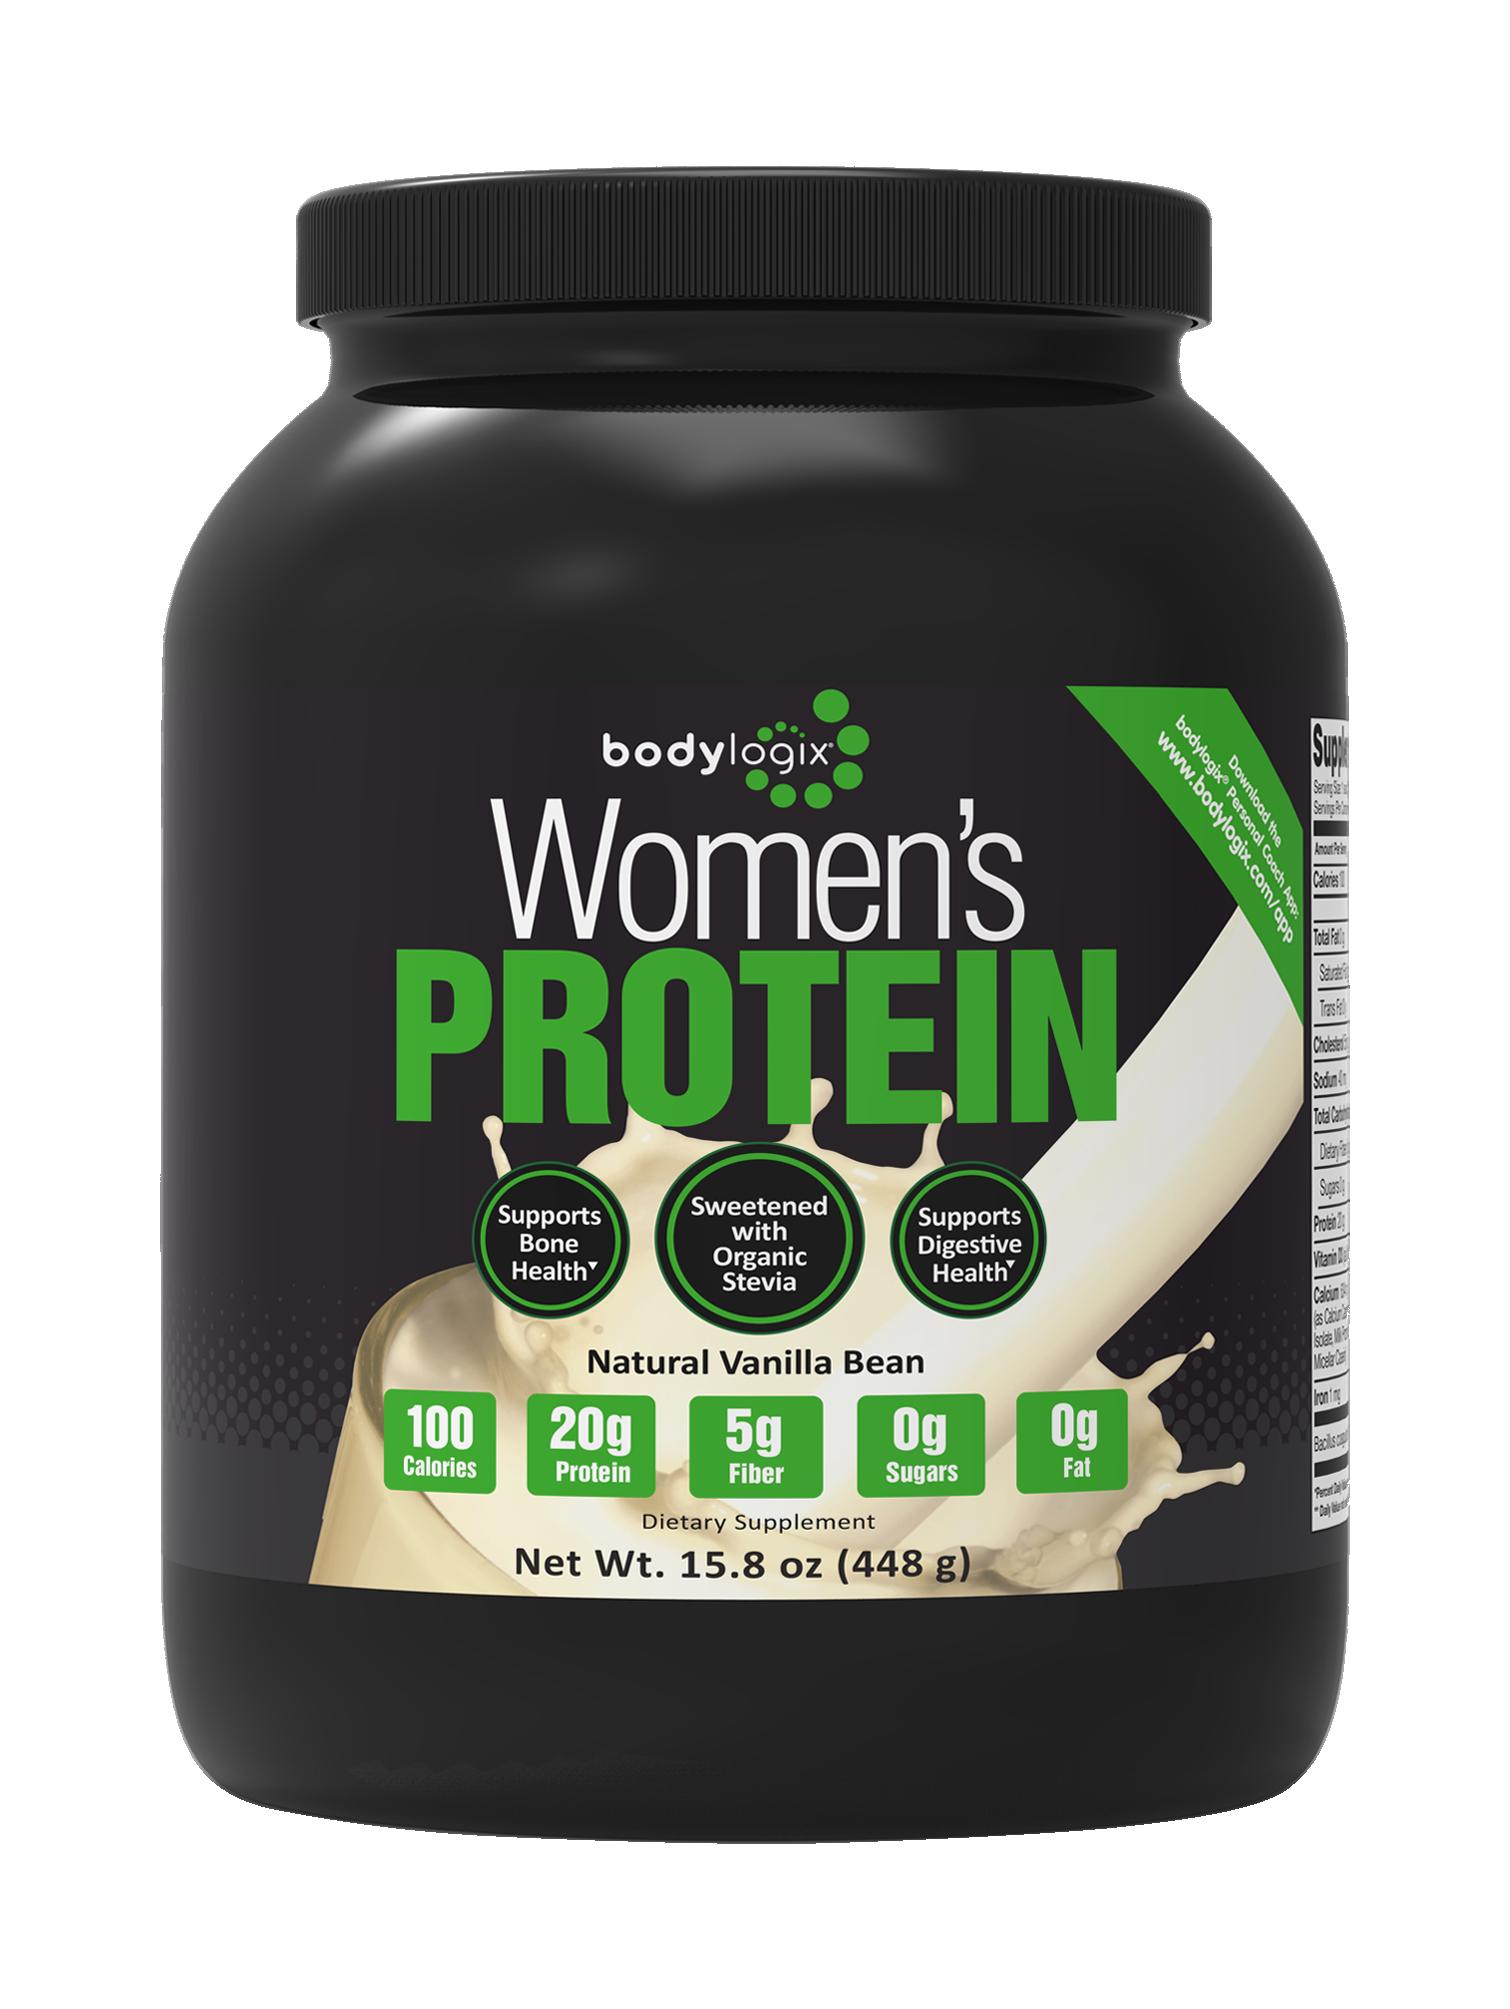 Amazon.com: Bodylogix Natural Grass-Fed Whey Protein Powder, Decadent Chocolate, 1.85 Pound